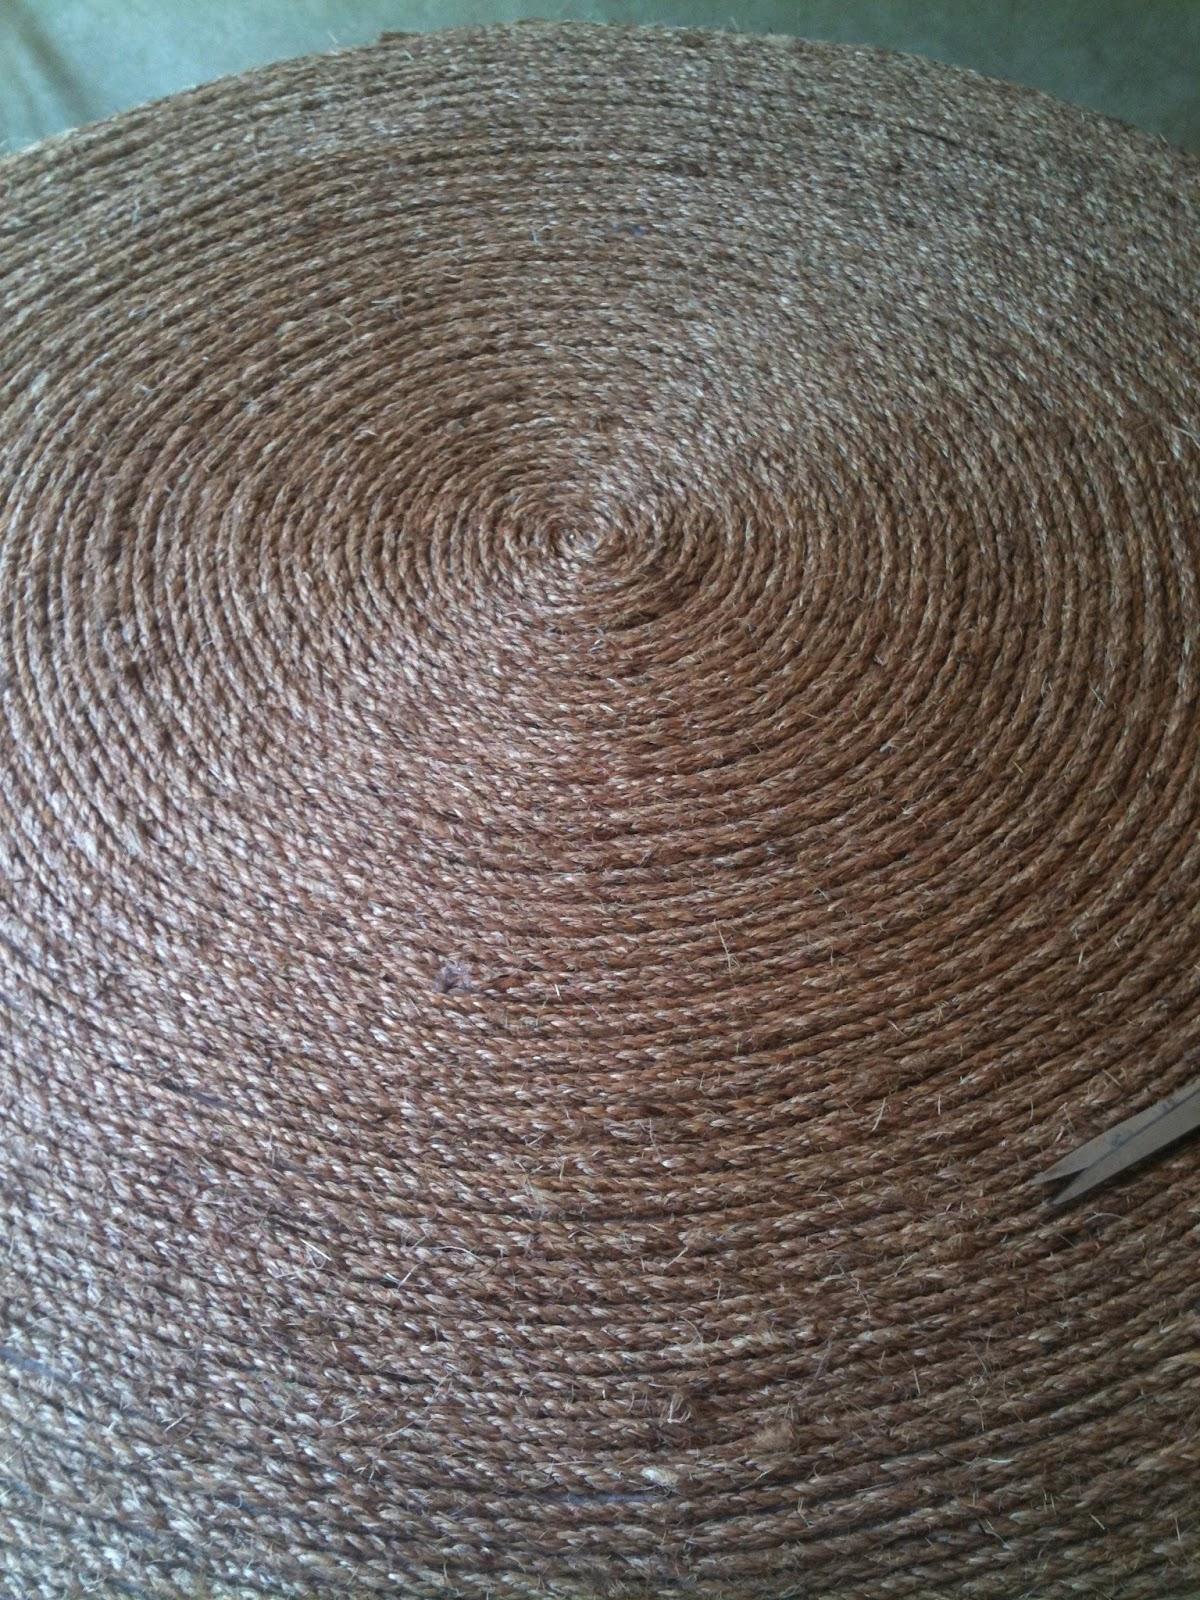 How To Make A Round Rug Les Fleurs